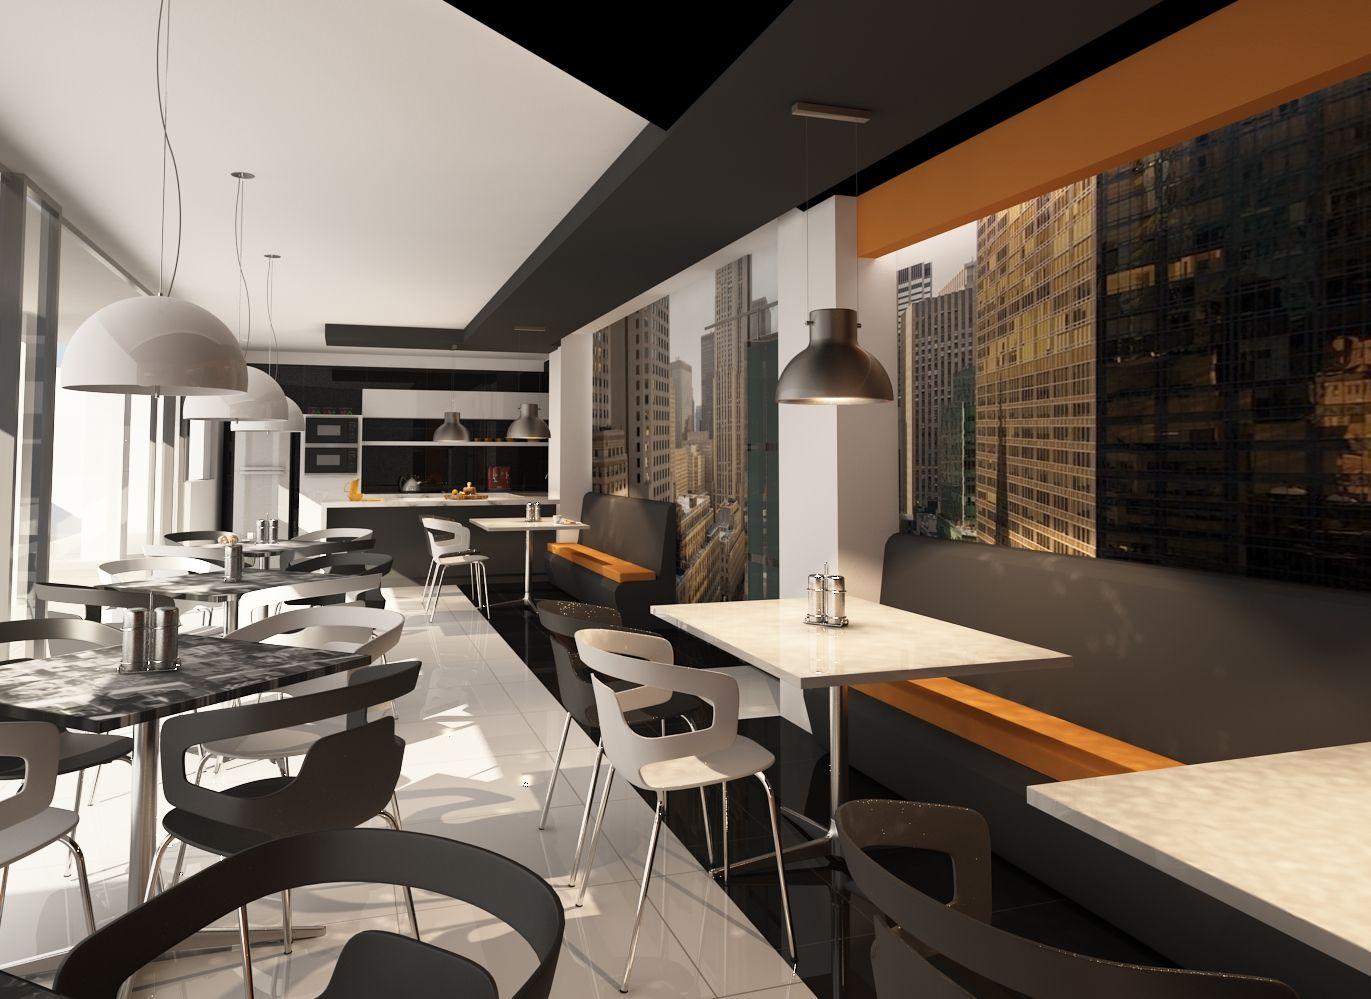 Diseño comercial cafetería moderno contemporáneo. | decoracion casa ...